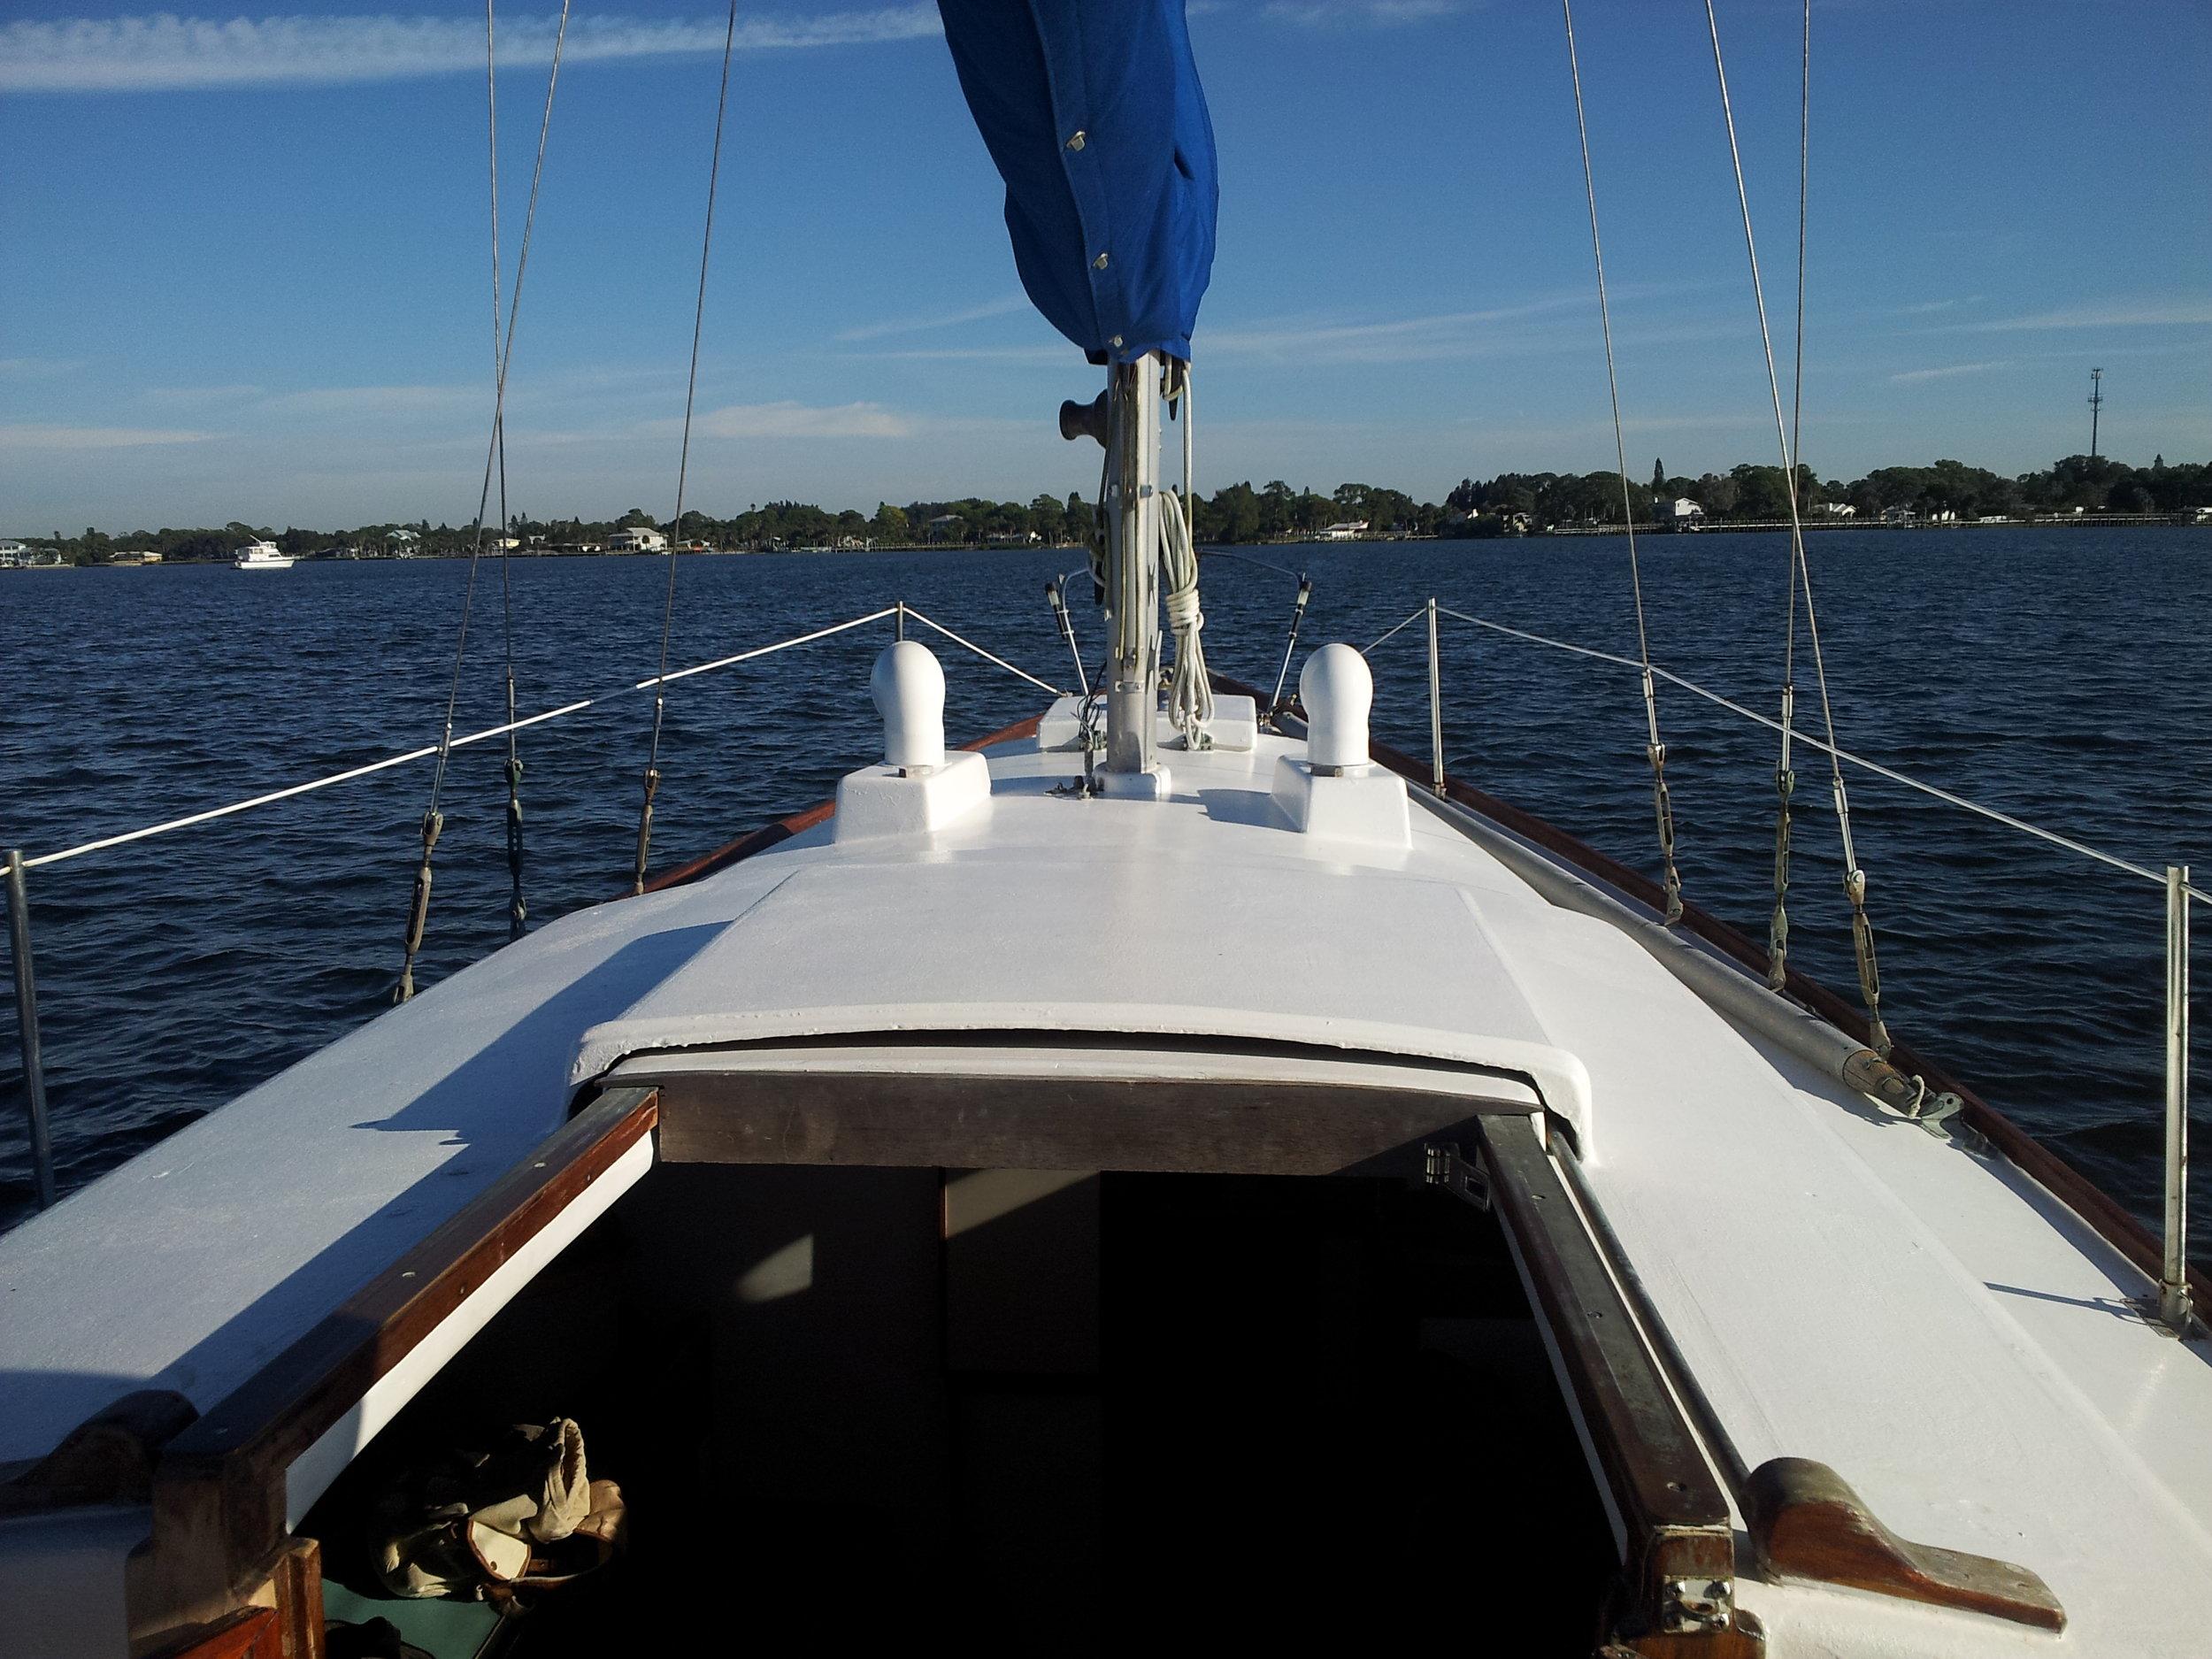 BoatDeck_November2014.jpg